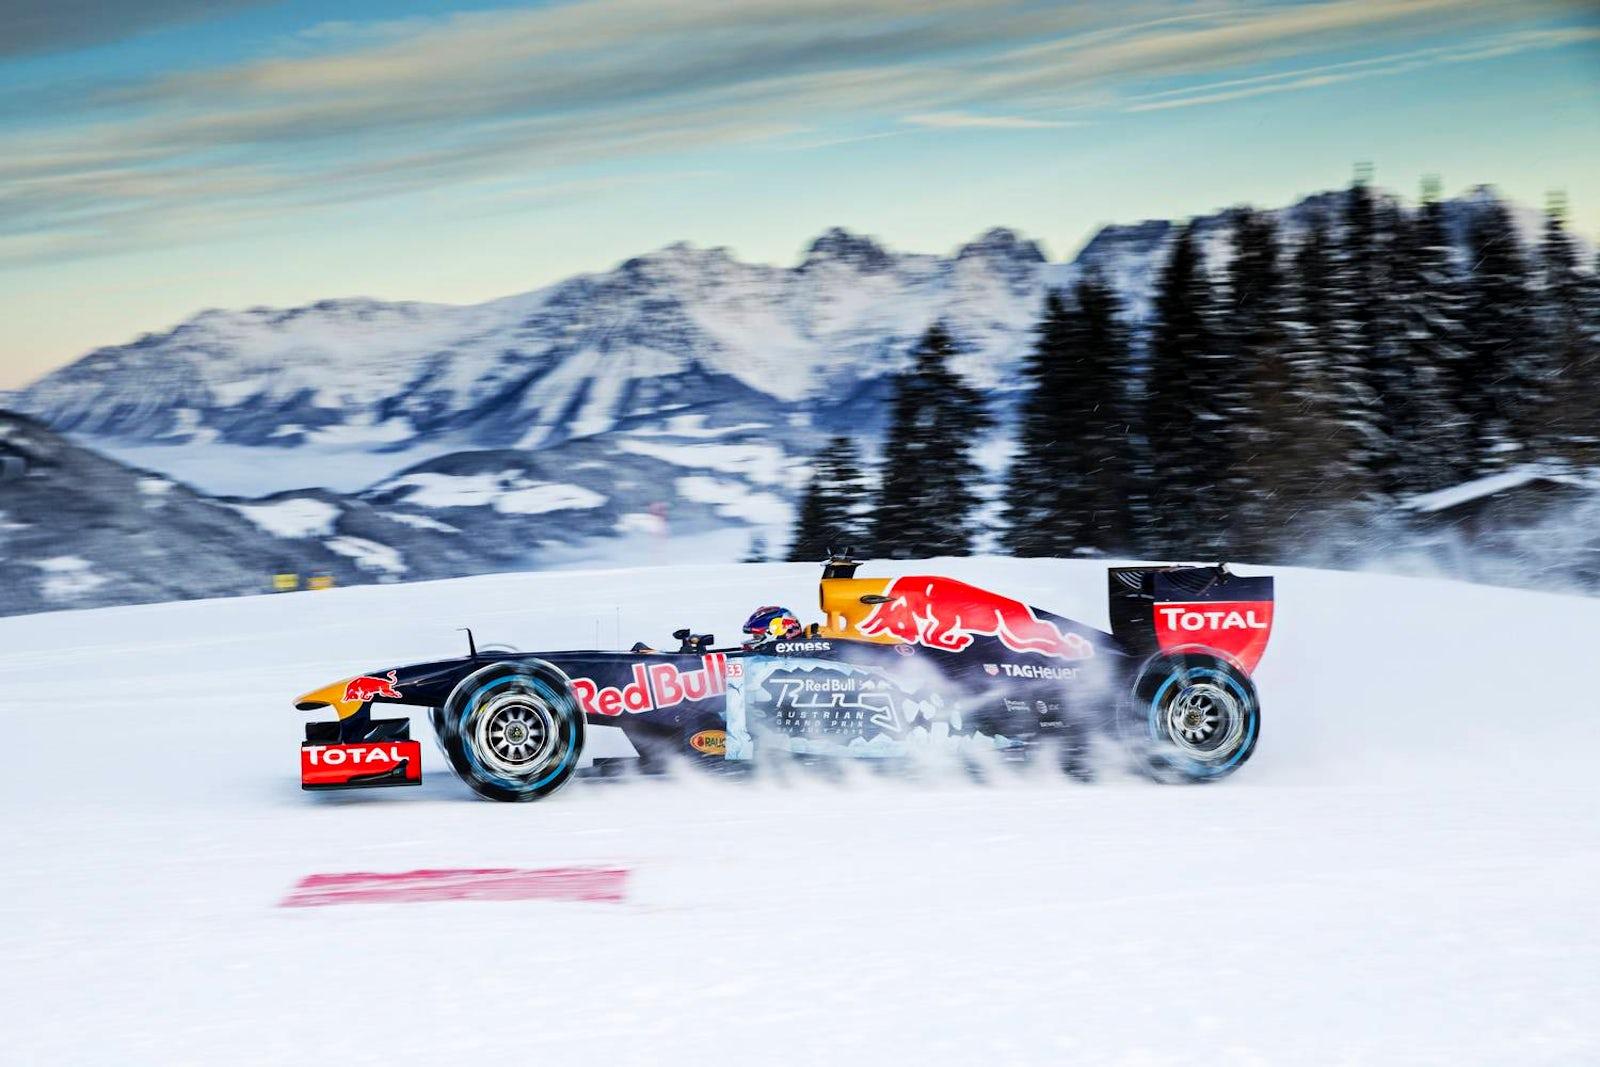 Cover photo © Samo Vidic and Philip Platzer/Red Bull Content Pool